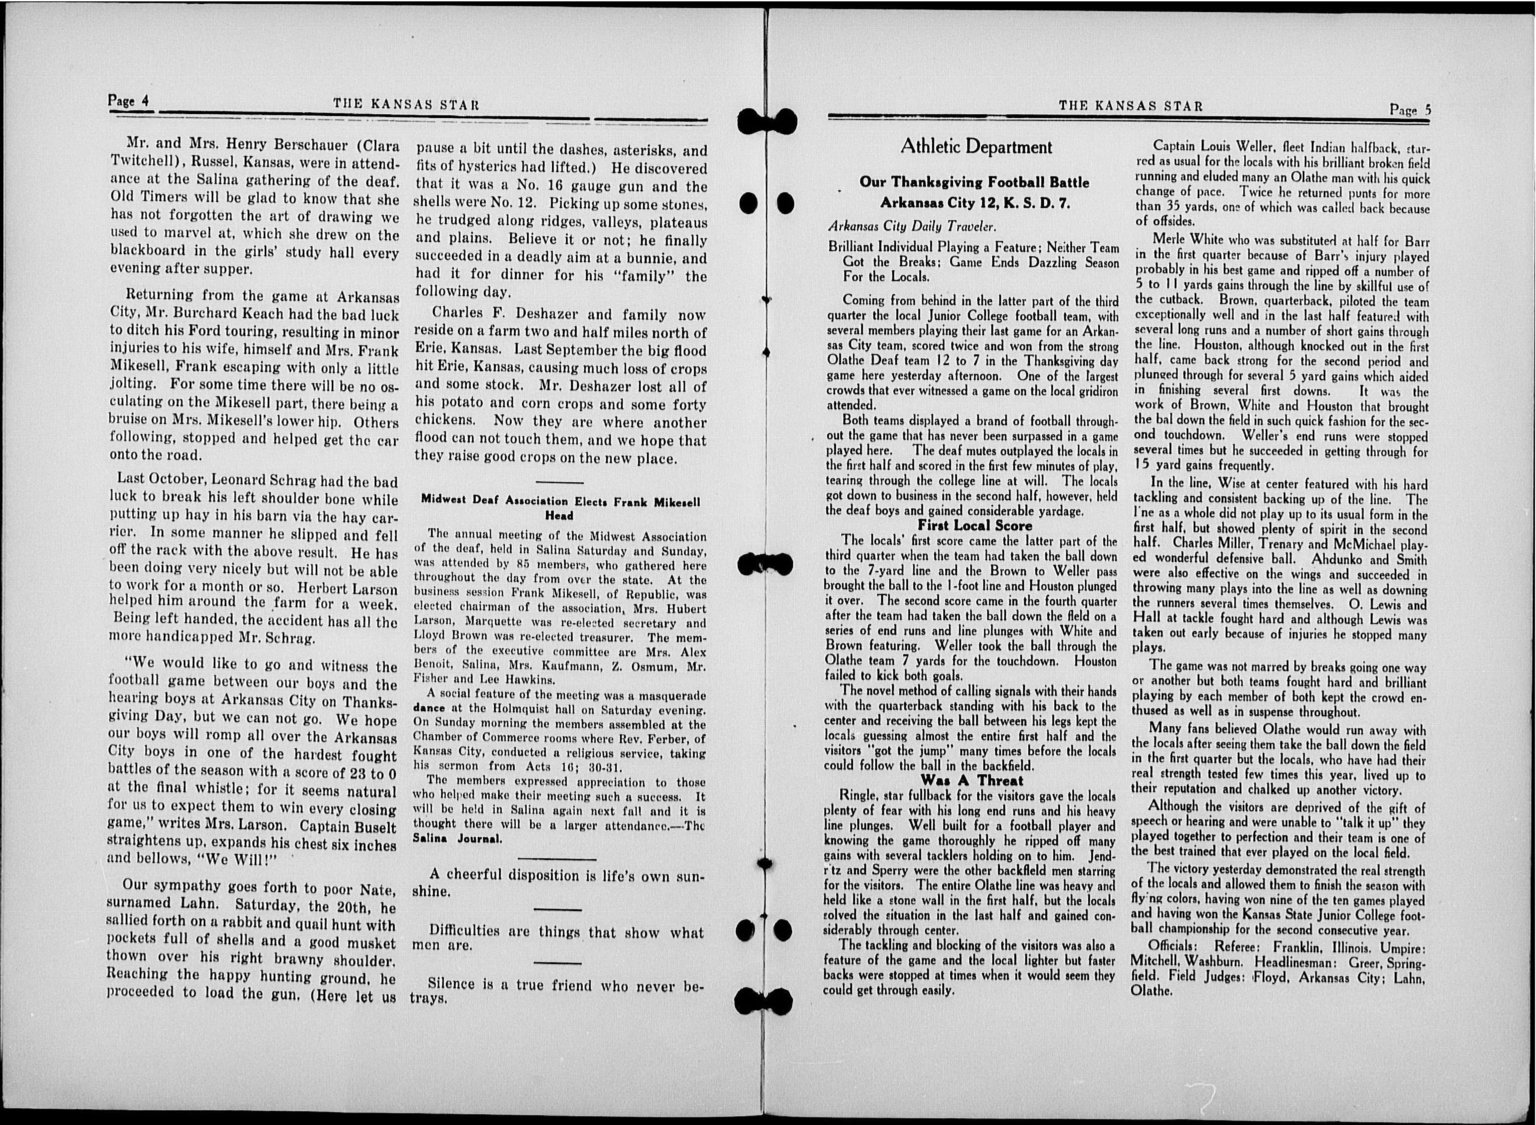 The Kansas Star, volume 50, number 6 - 4-5